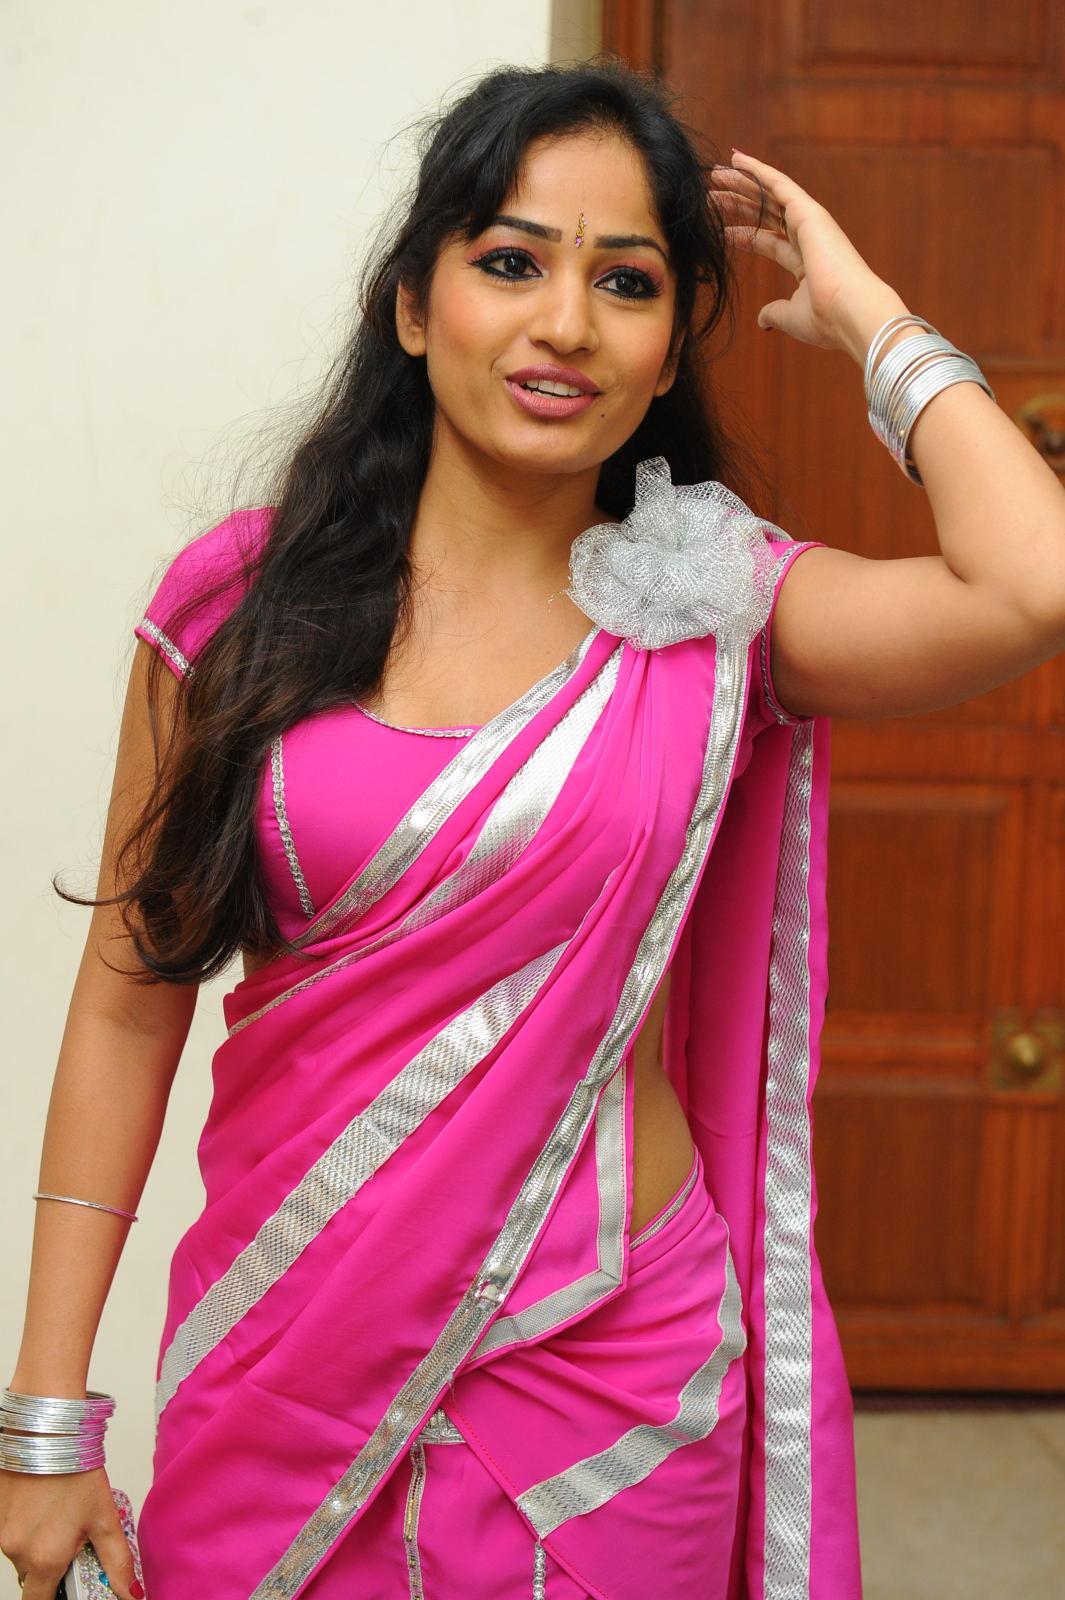 Spicy Saree: Madhavi Latha Spicy In Pink Saree Photo Gallery